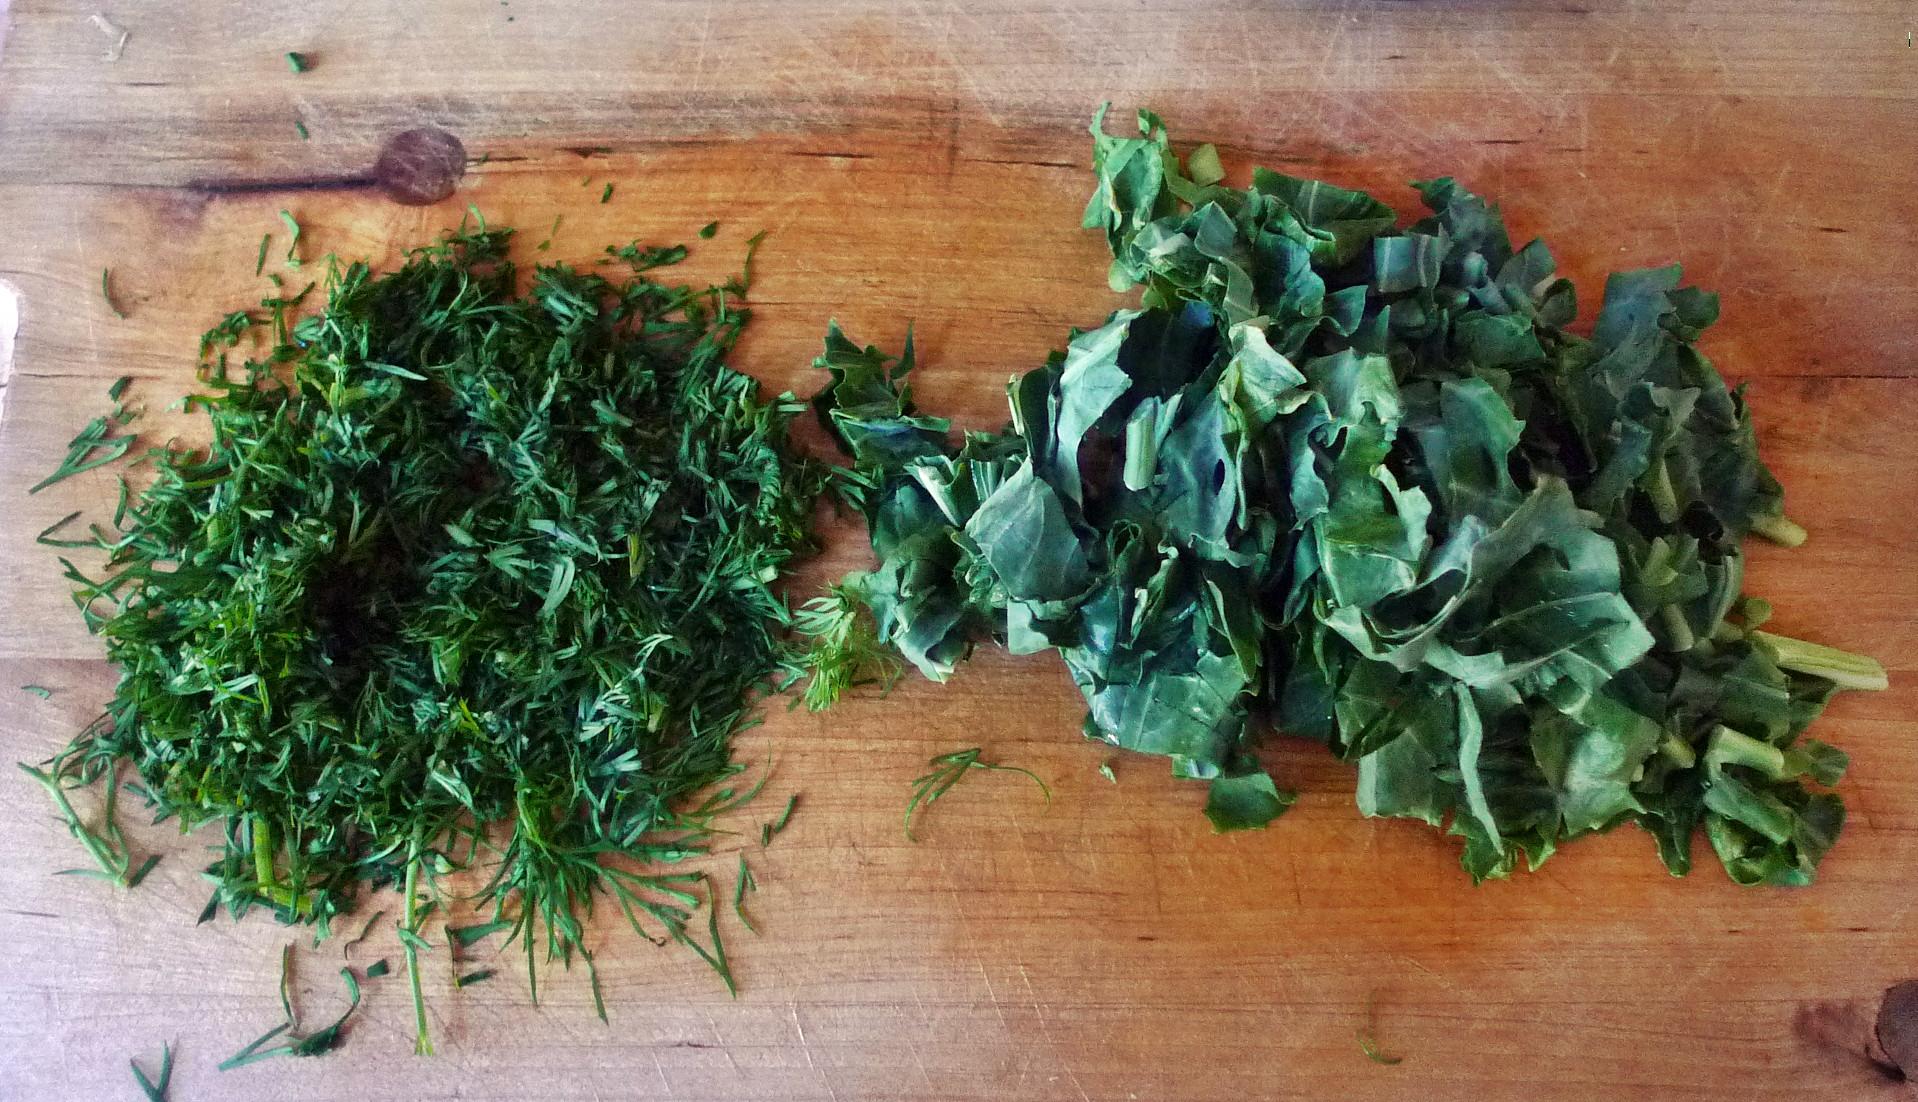 Selleriegemüse,Gurkensalat,Kartoffeln,Quarkspreise-19.3.15   (5)